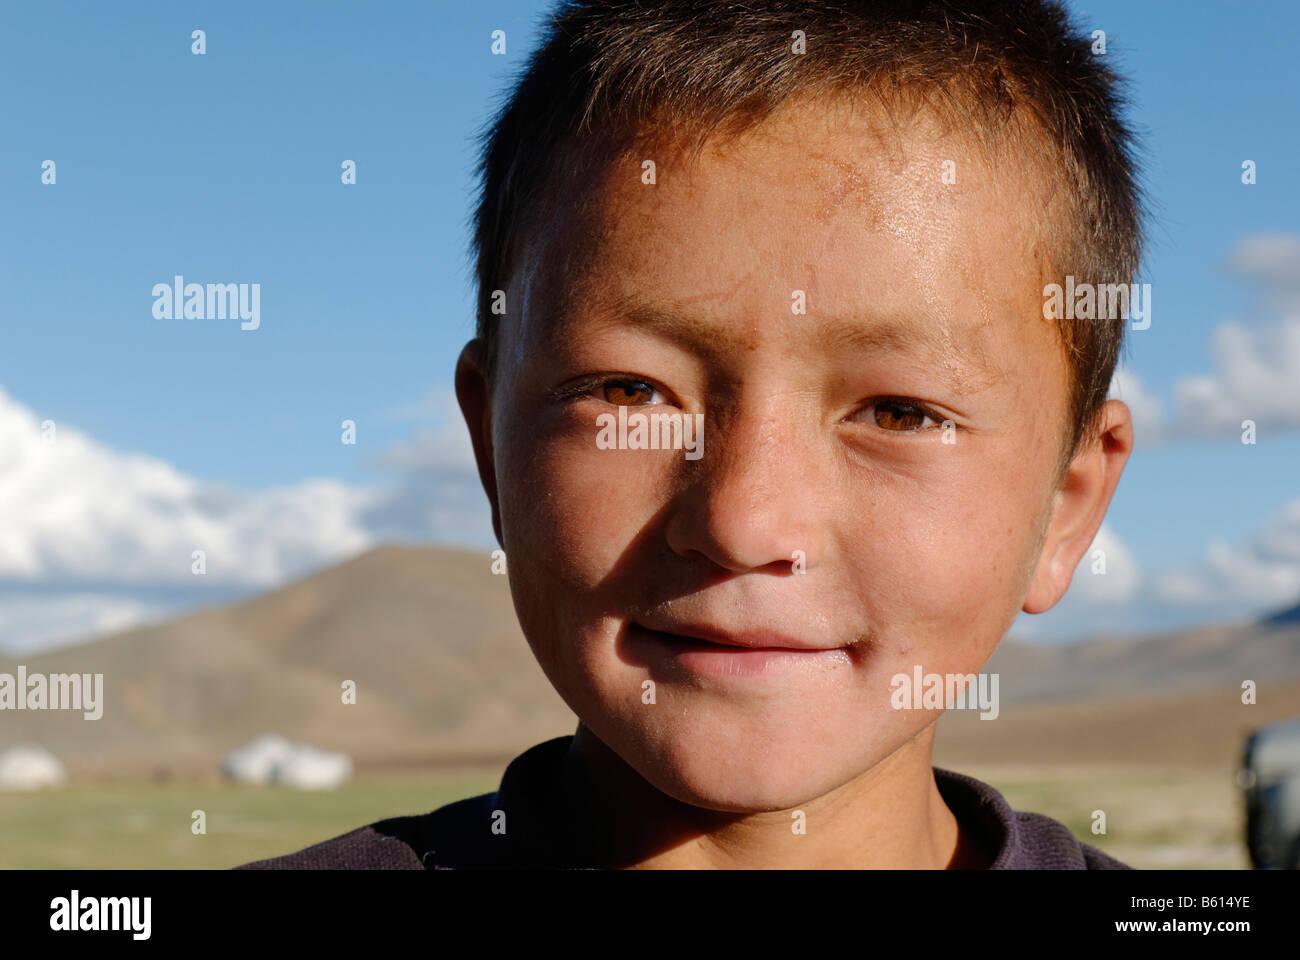 Kazakh, Mongolian boy, Kazakhstan, Mongolia, Asia - Stock Image